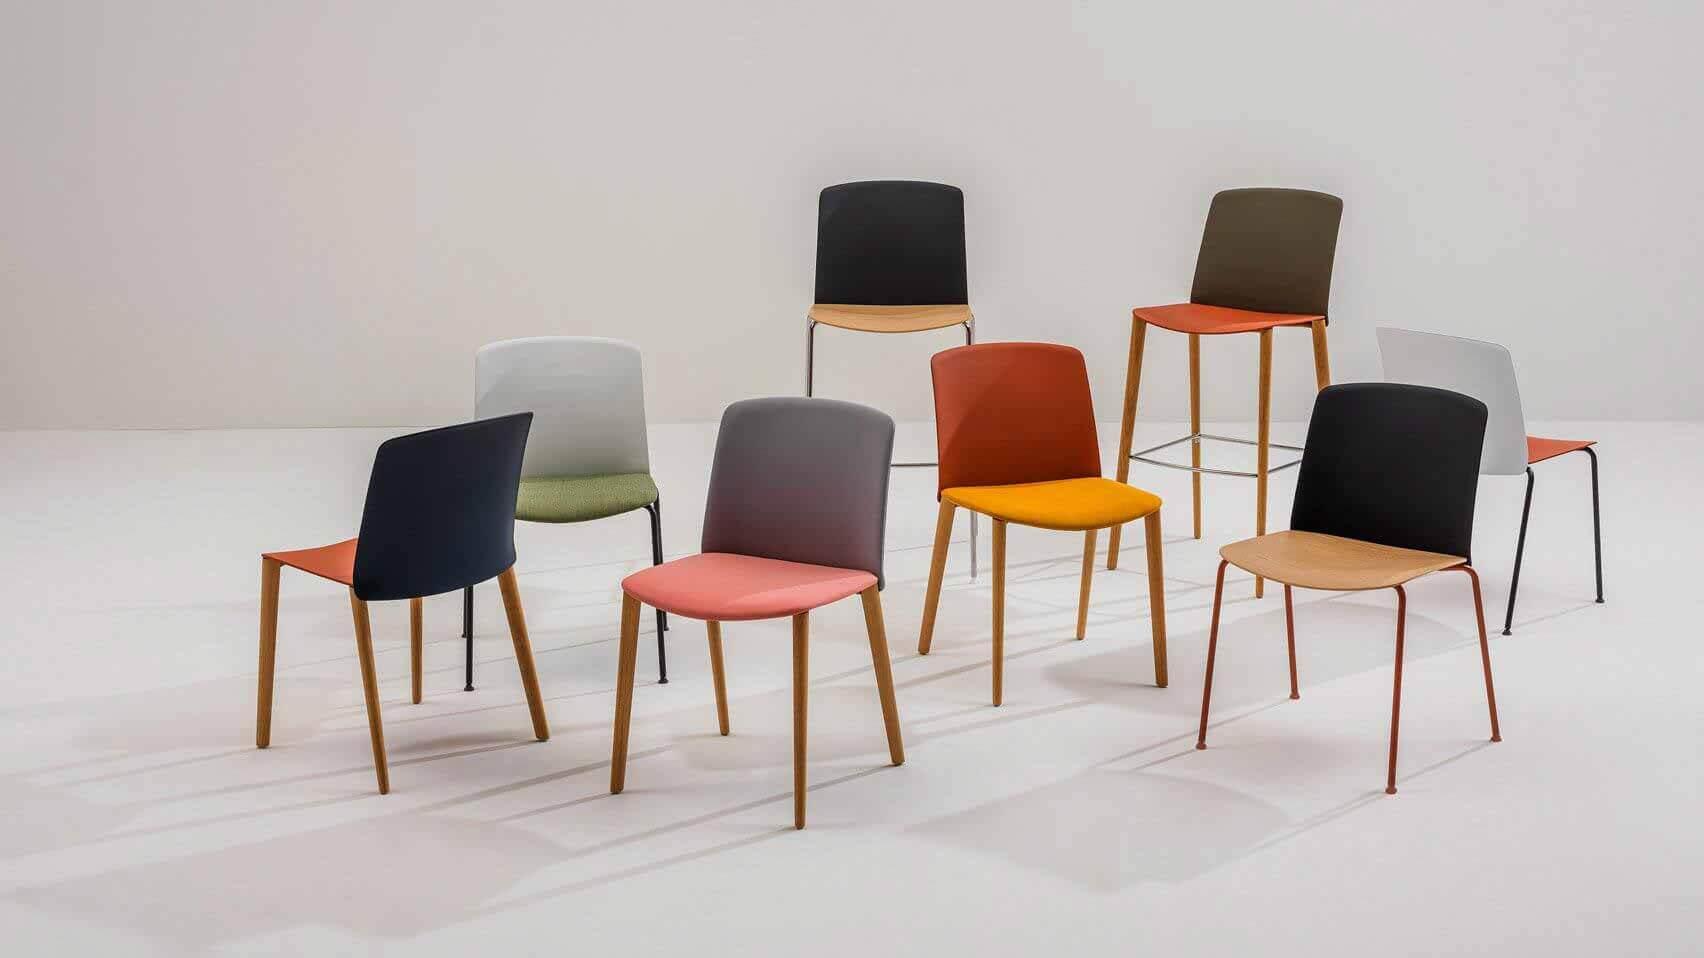 Arper представит новые и классические продукты на Salone del Mobile